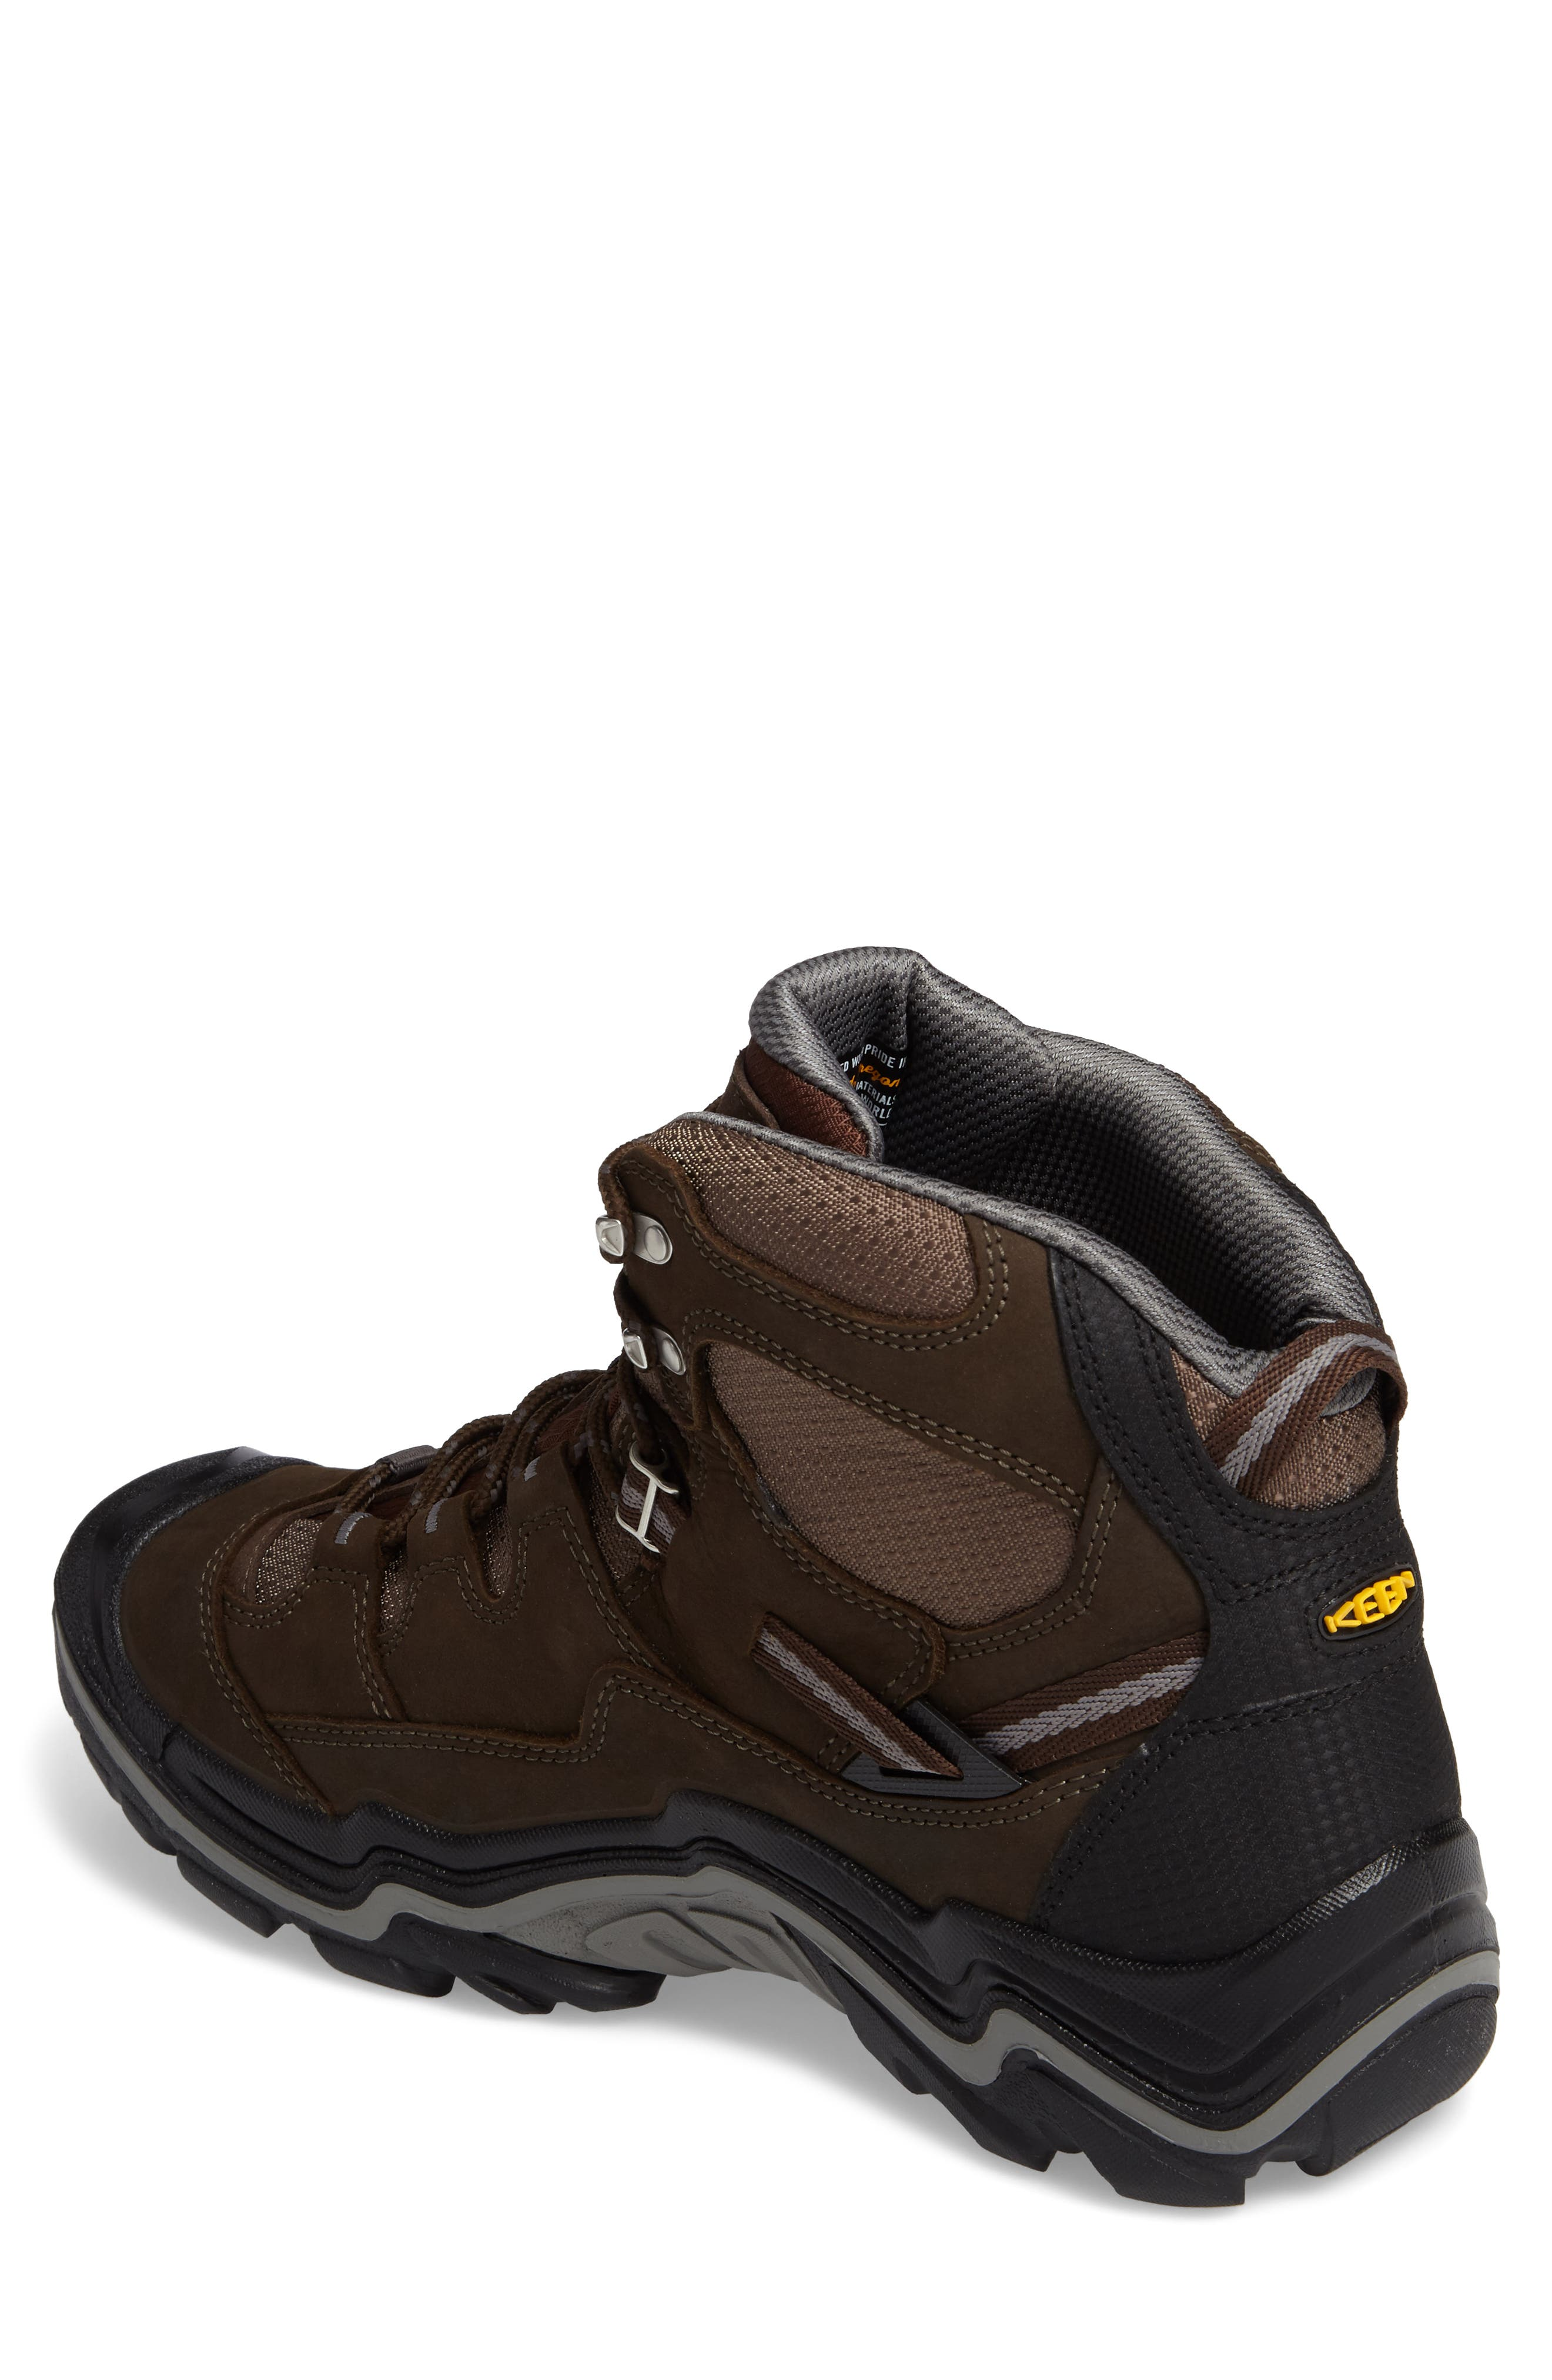 Alternate Image 2  - Keen Durand Mid Waterproof Hiking Boot (Men)